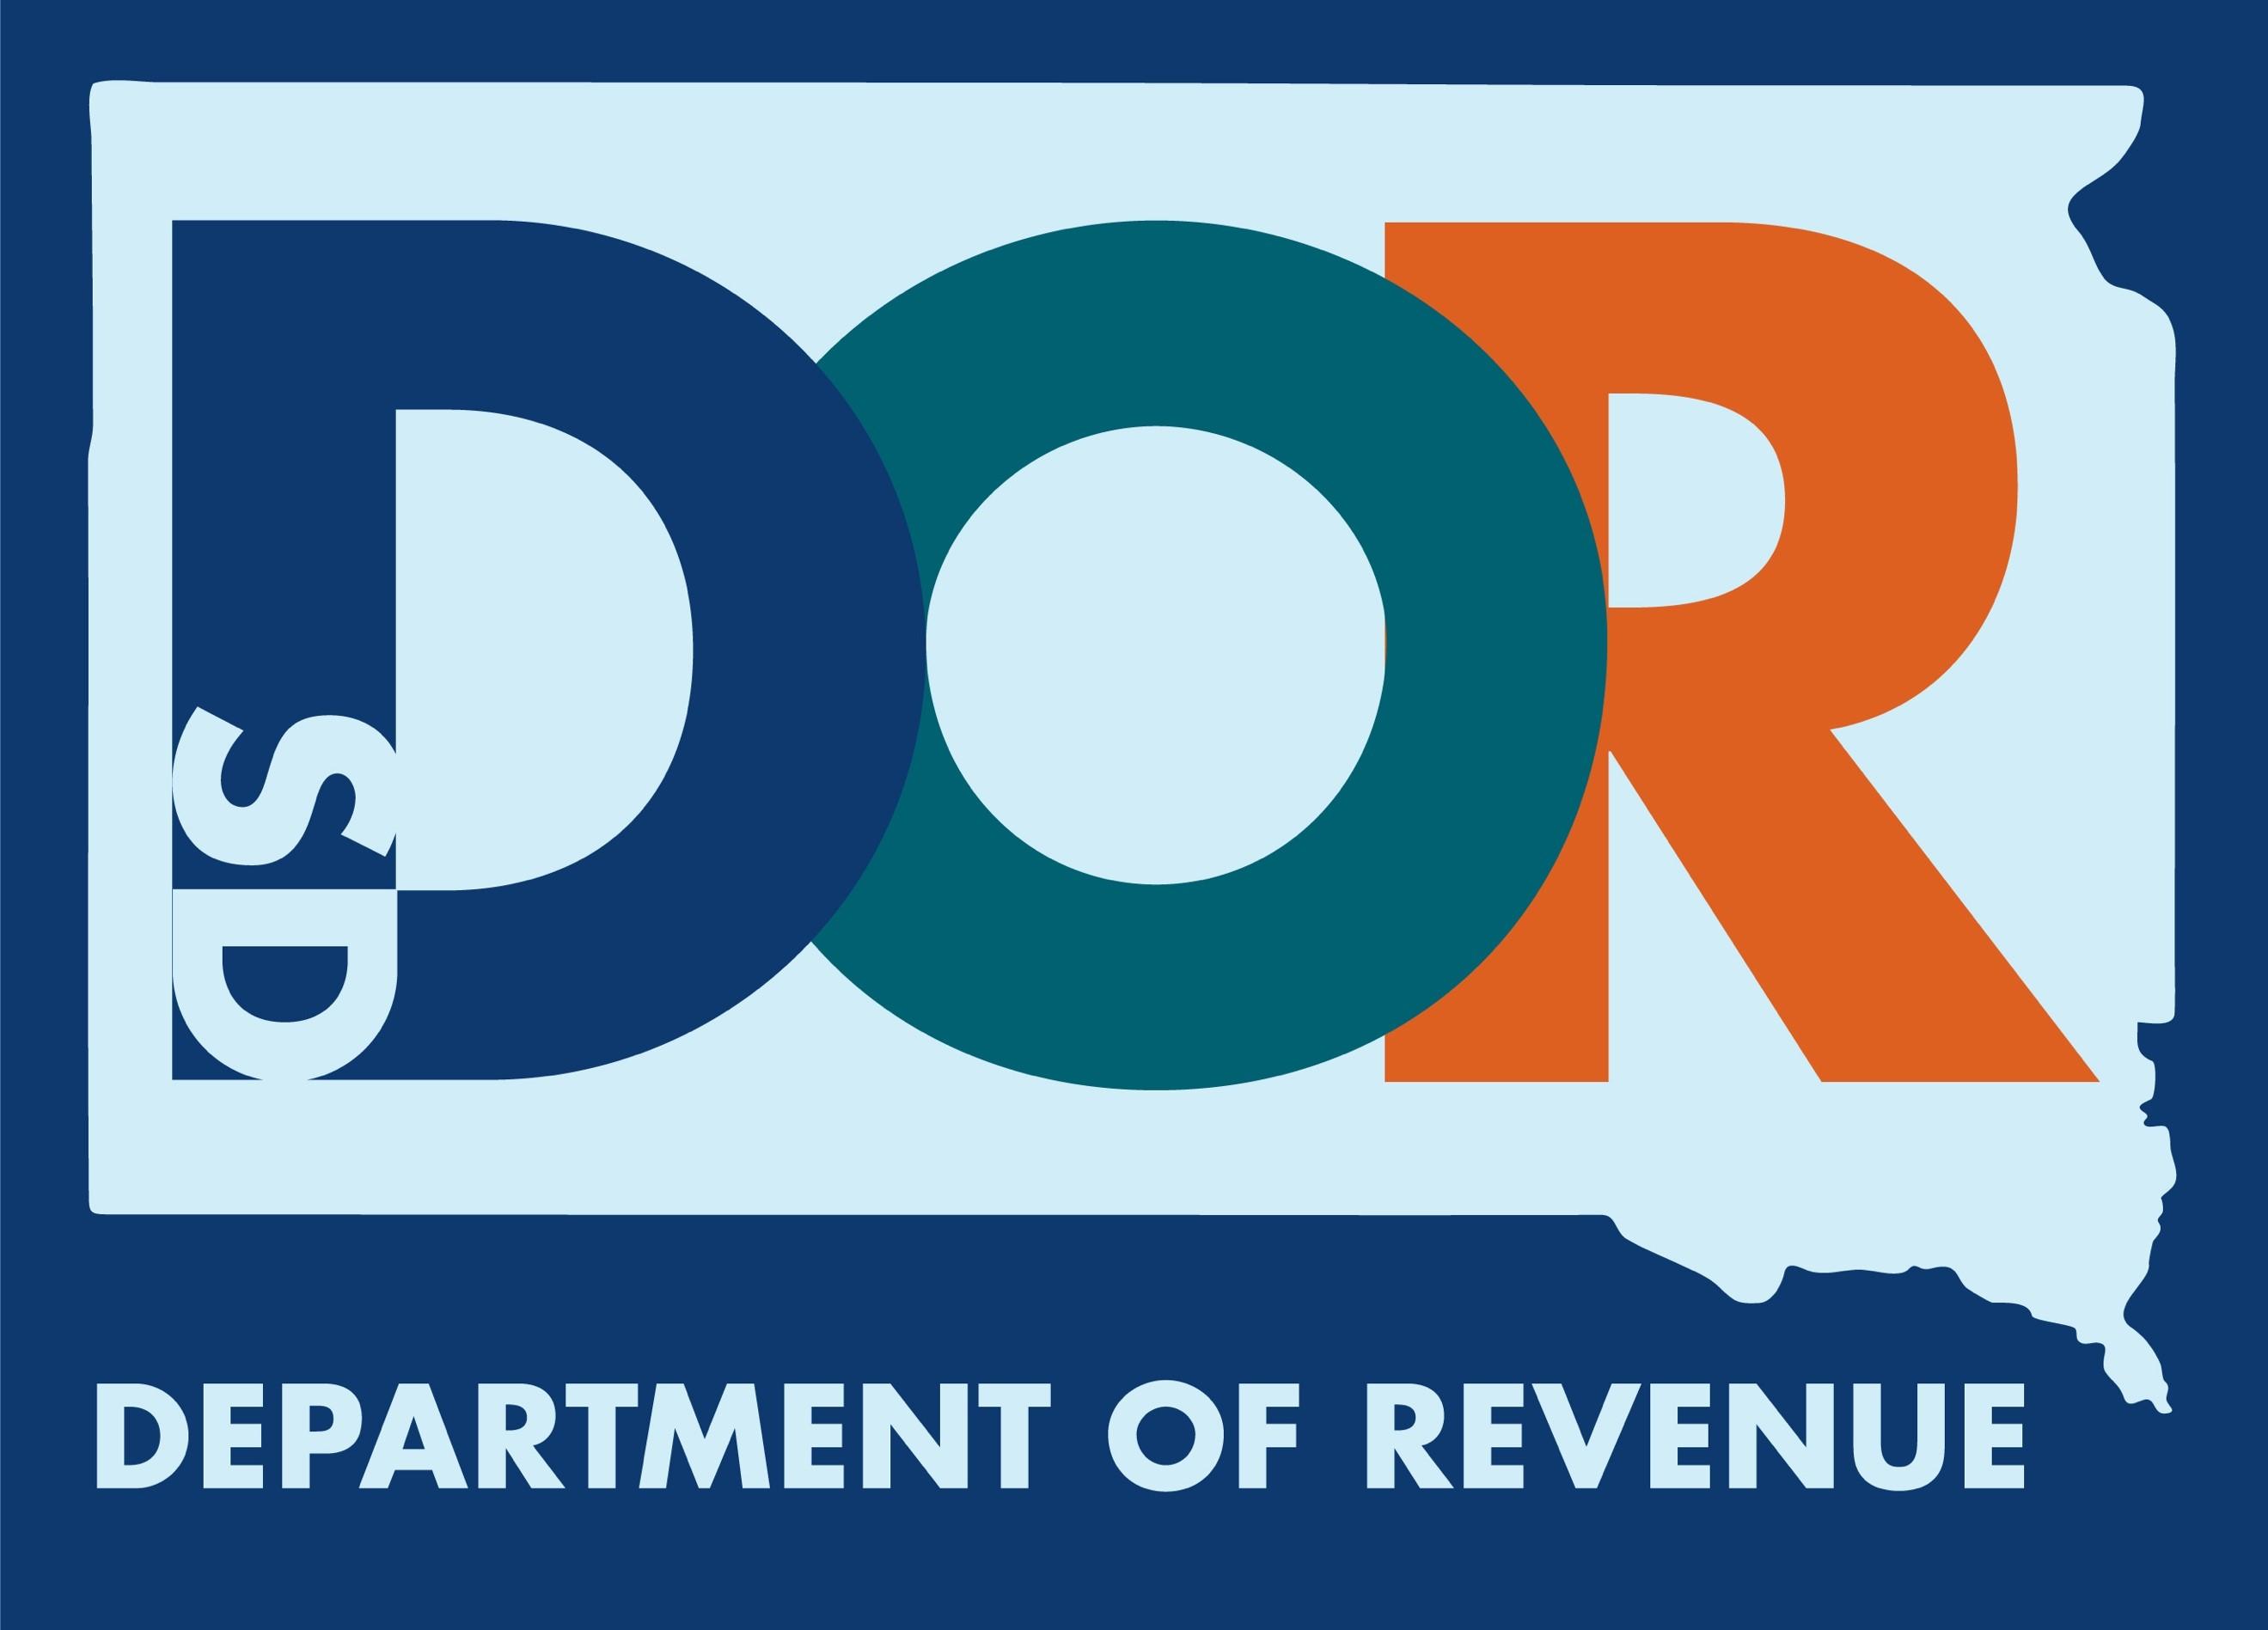 SOUTH DAKOTA DEPARTMENT OF REVENUE Division of Administration Performance & Data Innovation Team